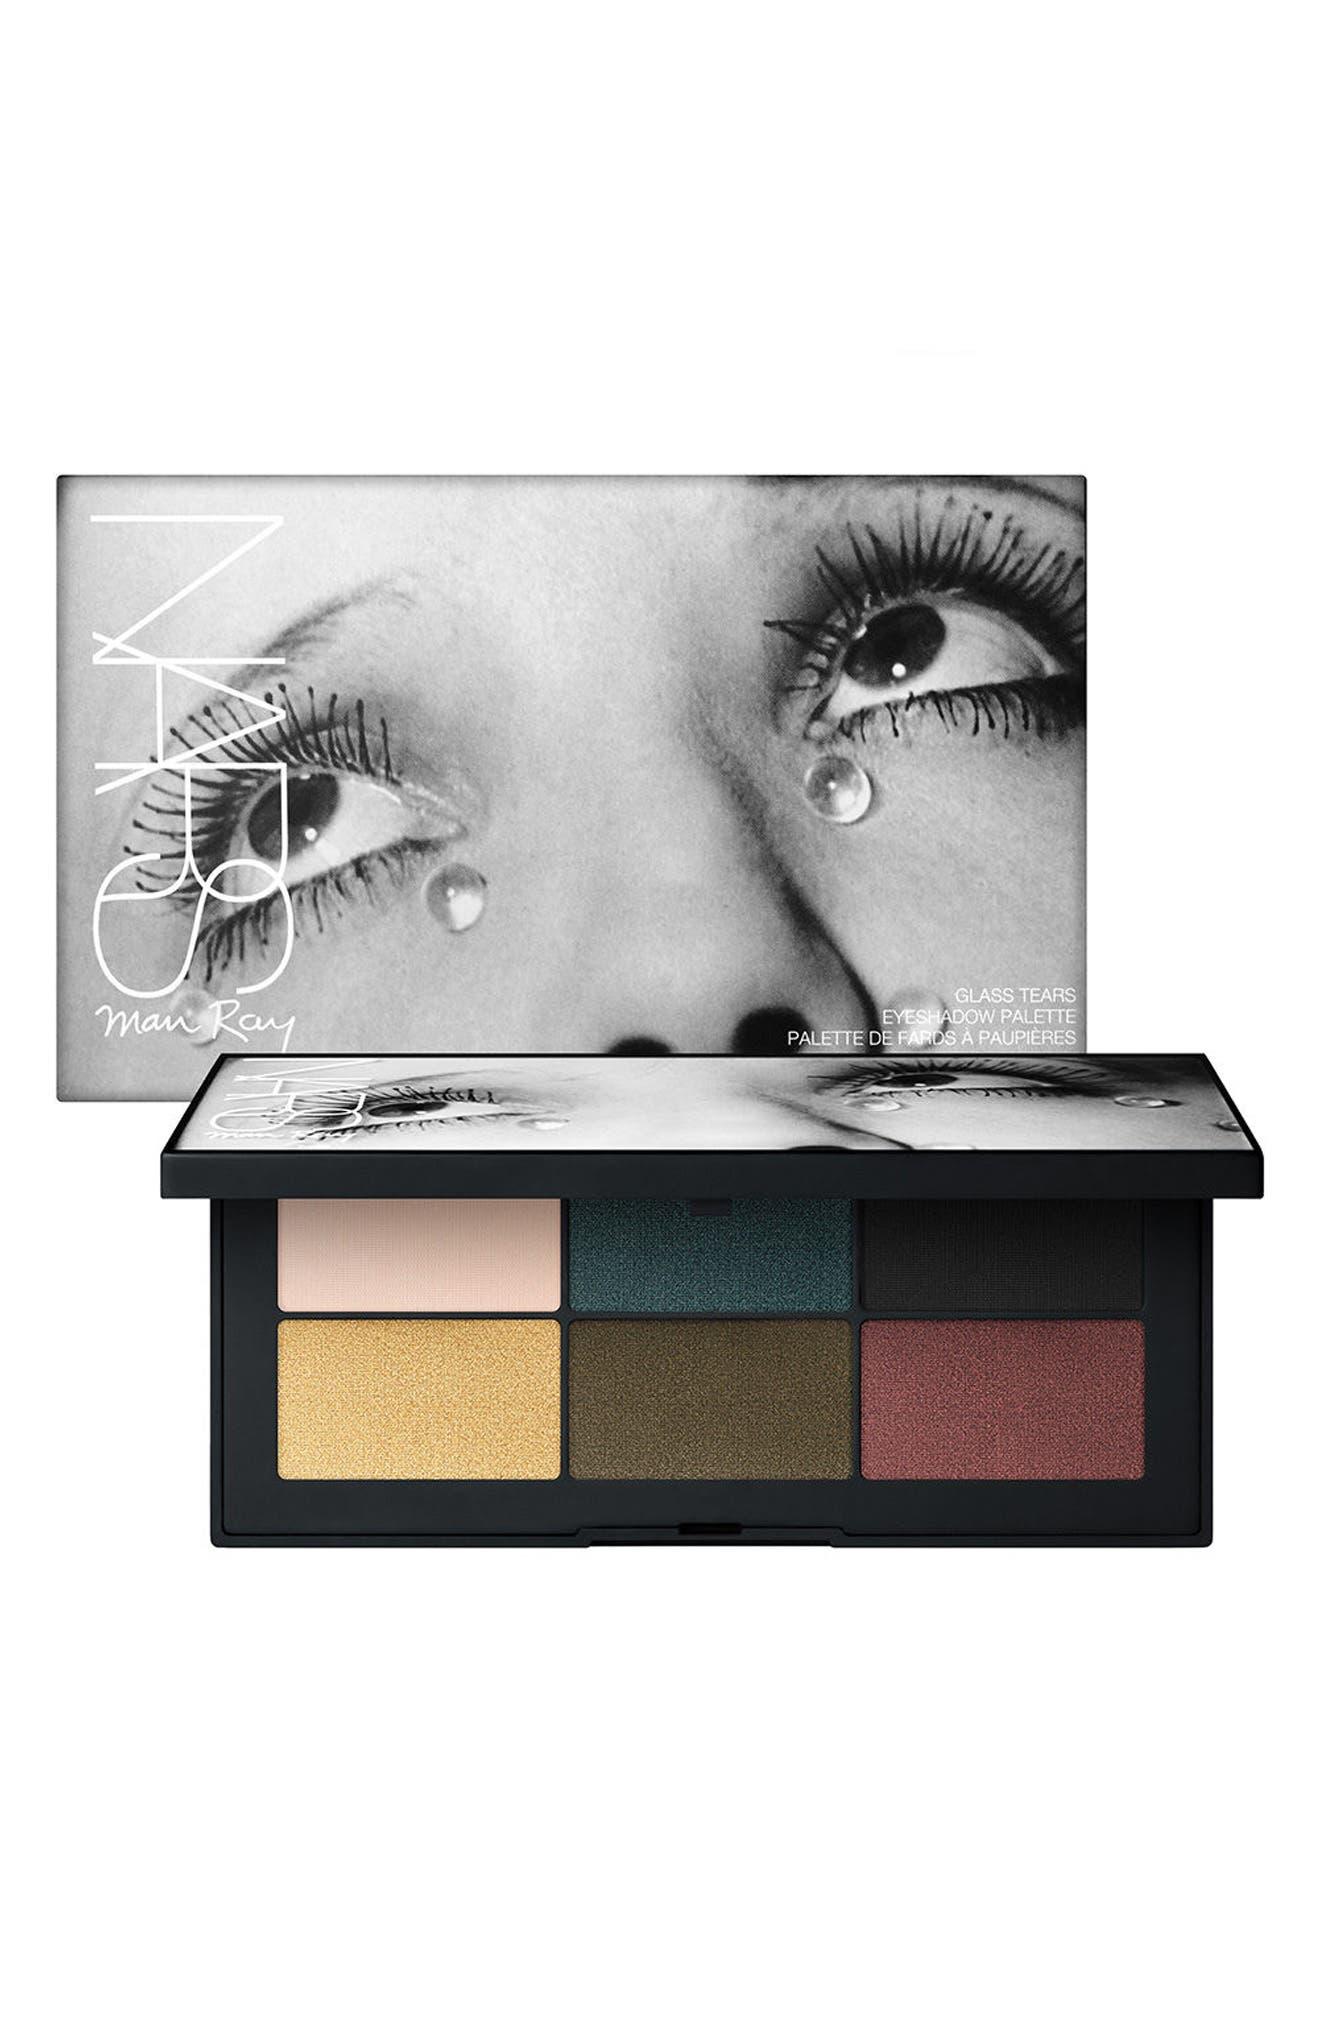 Man Ray Glass Tears Eyeshadow Palette,                             Main thumbnail 1, color,                             000